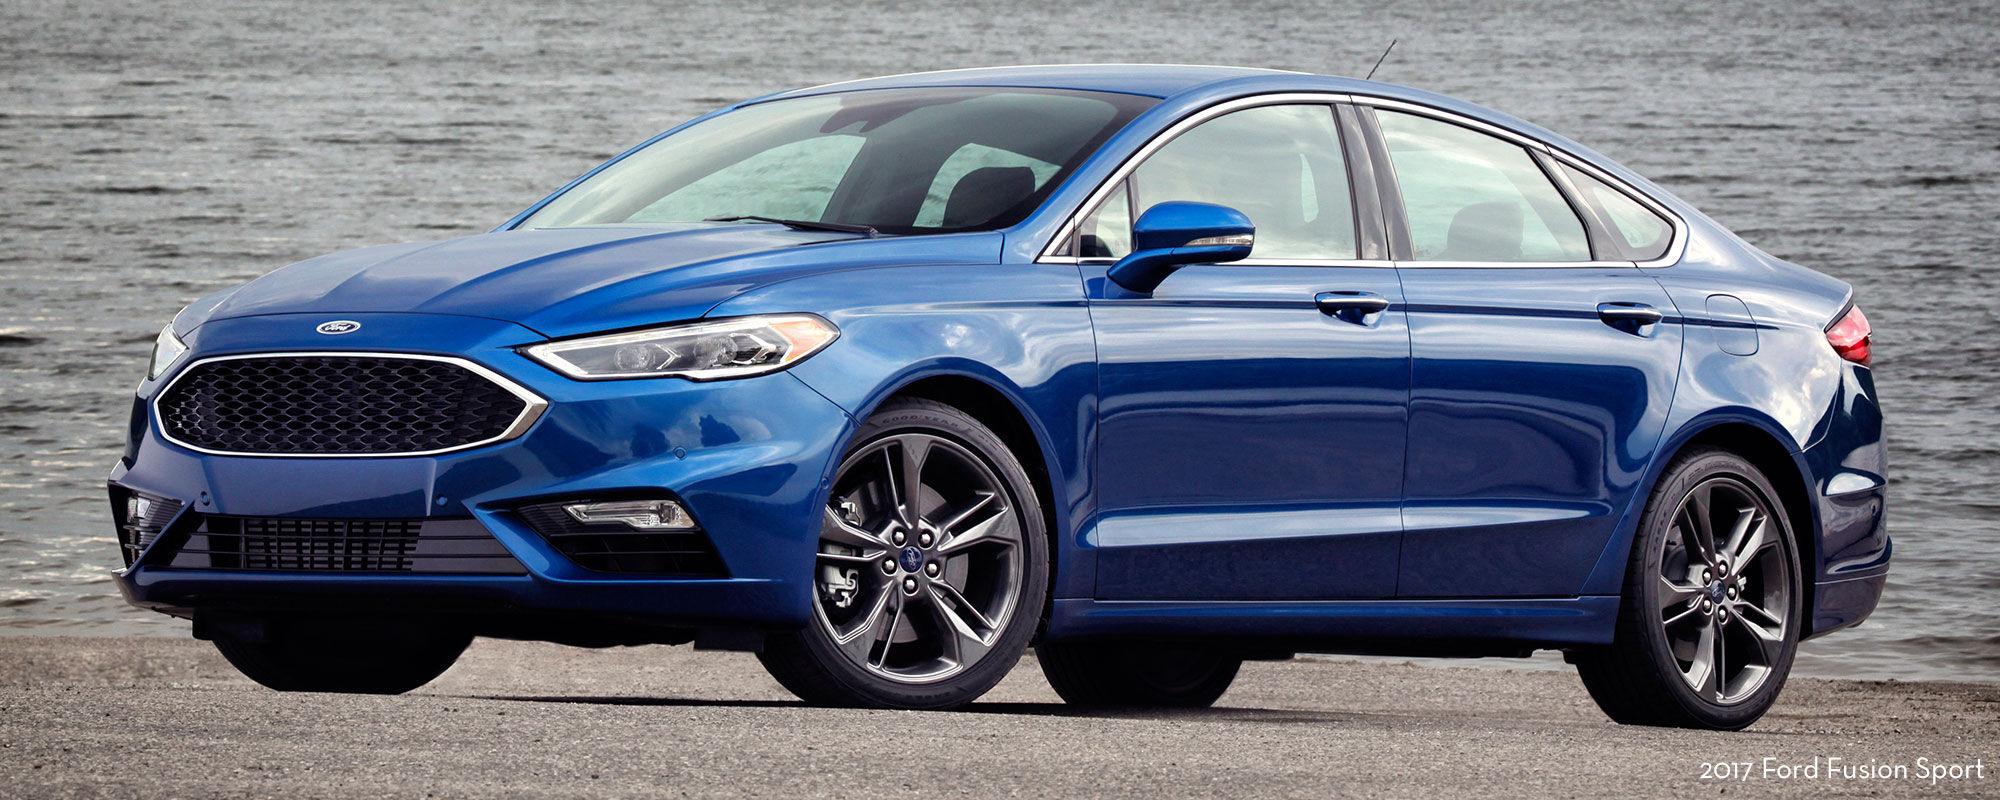 2017 Midlands International Auto Show - Ford Fusion Sport